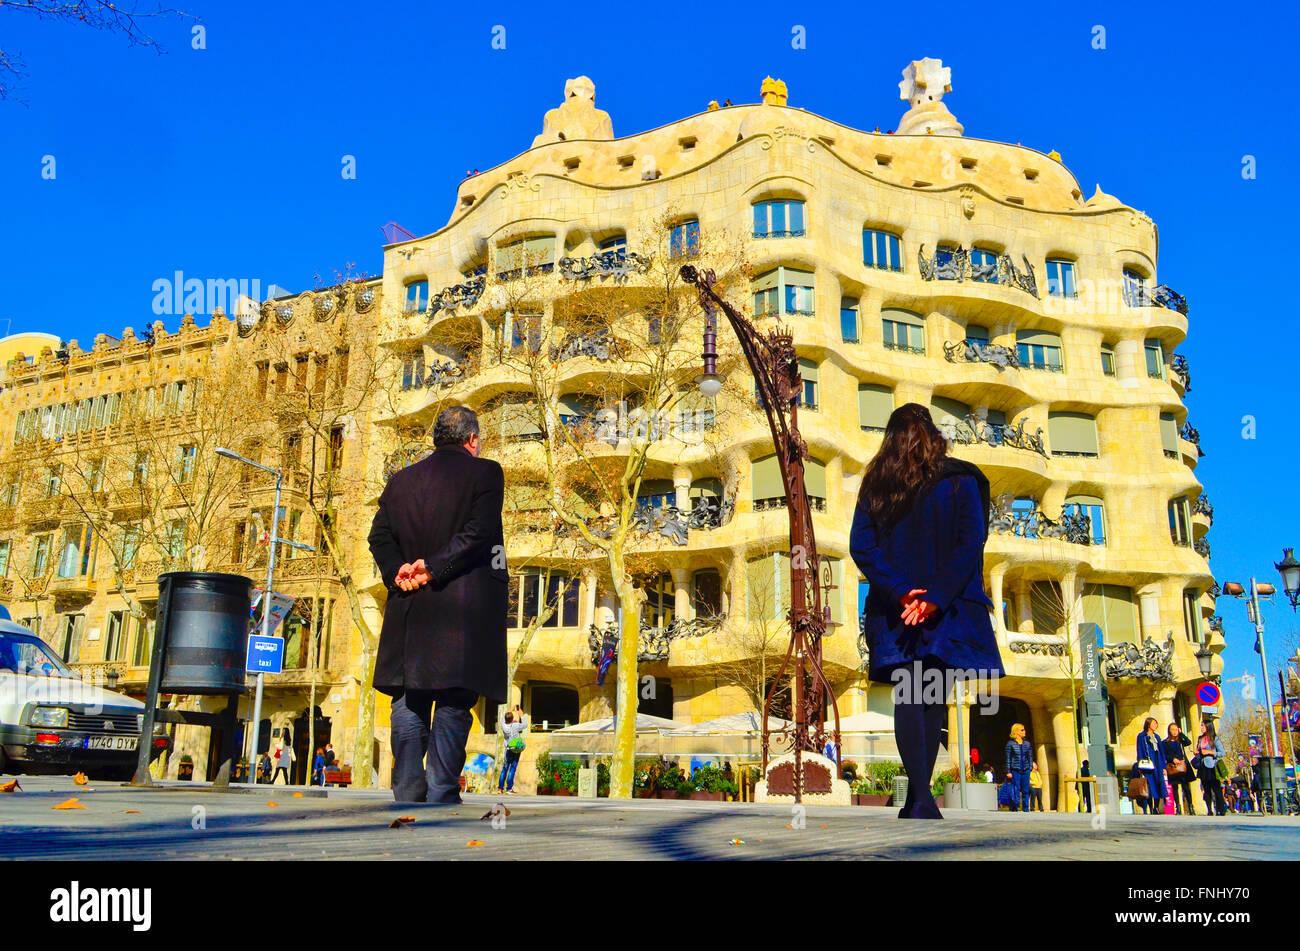 Casa Mila aka La Pedrera, designed by architect Antoni Gaudi. Barcelona, Catalonia, Spain. Stock Photo